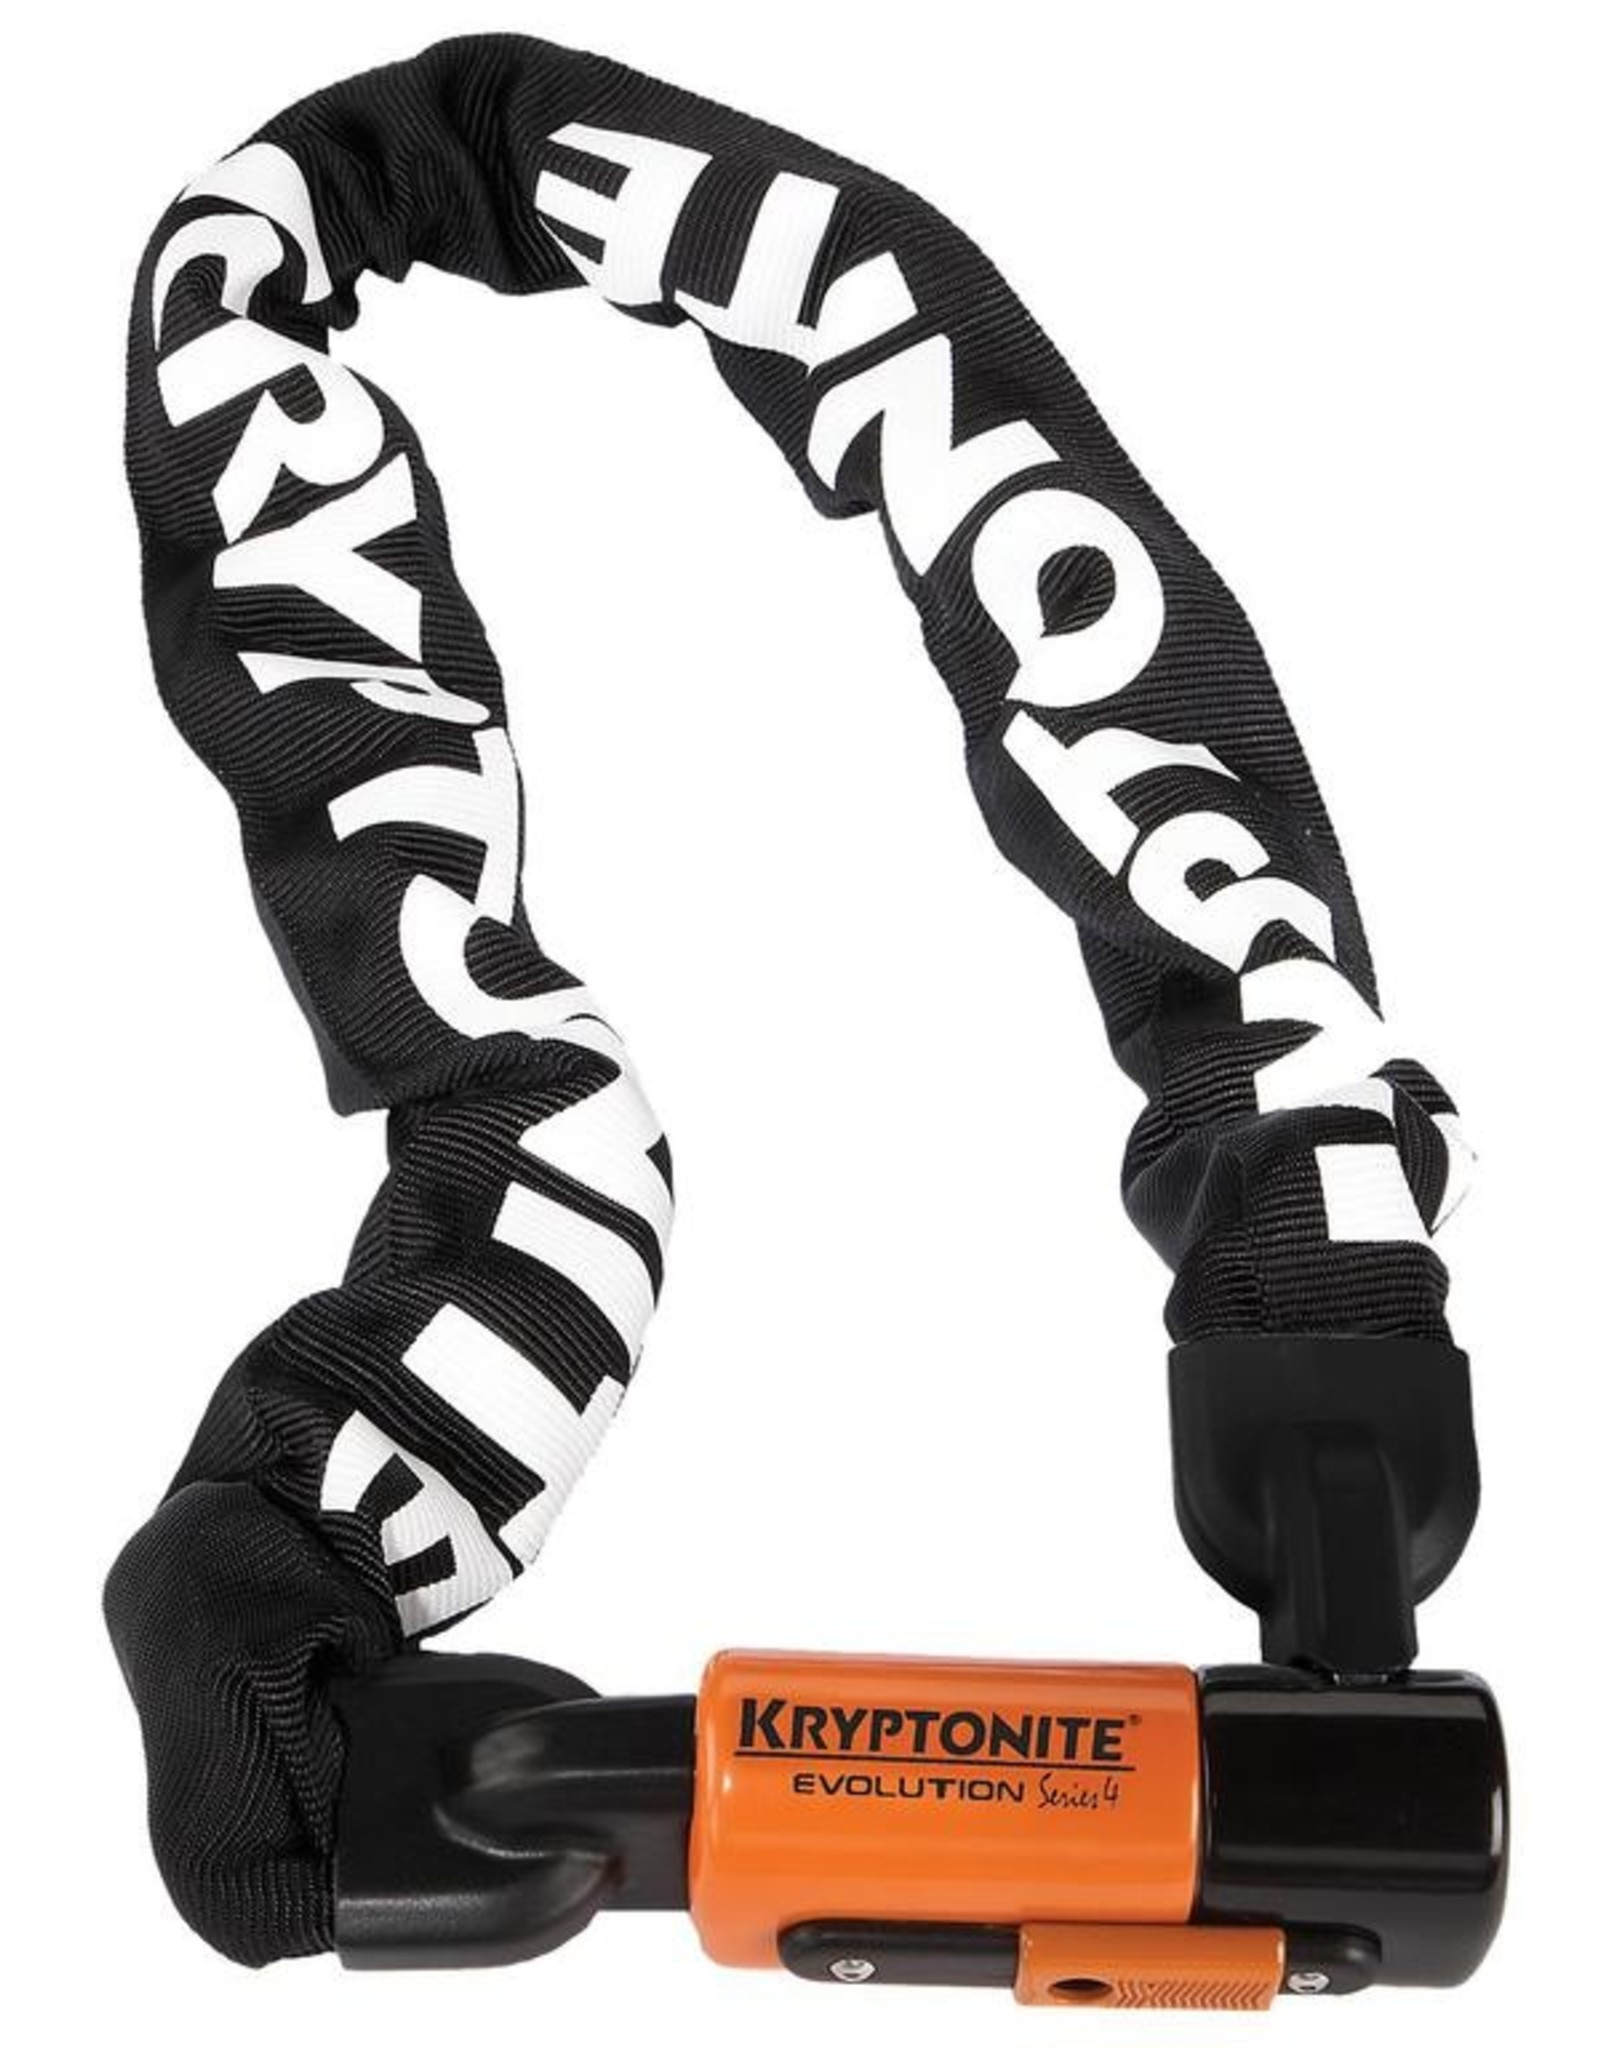 Kryptonite Kryptonite Keeper Lock Evo 1090 Chain